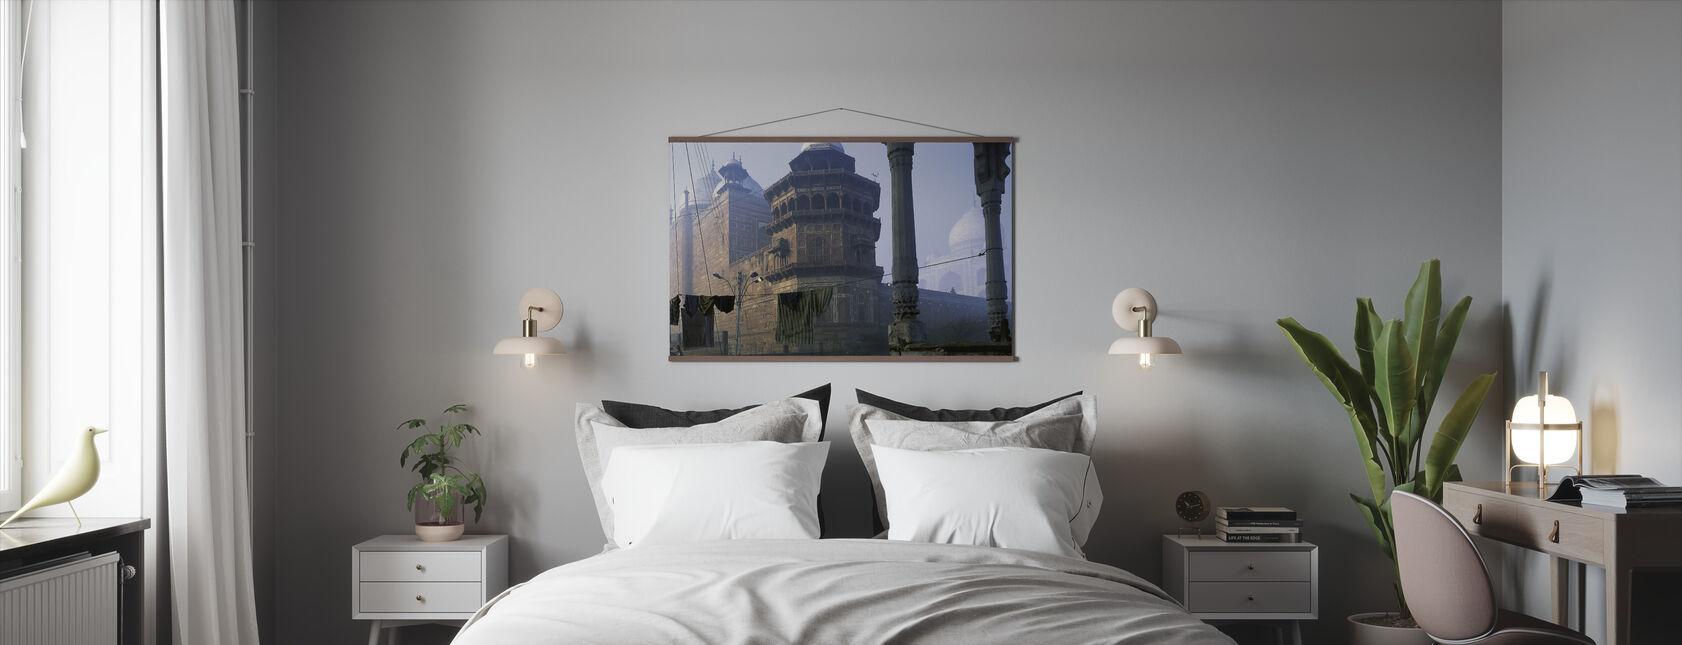 Taj Mahal, Agra, India - Poster - Bedroom